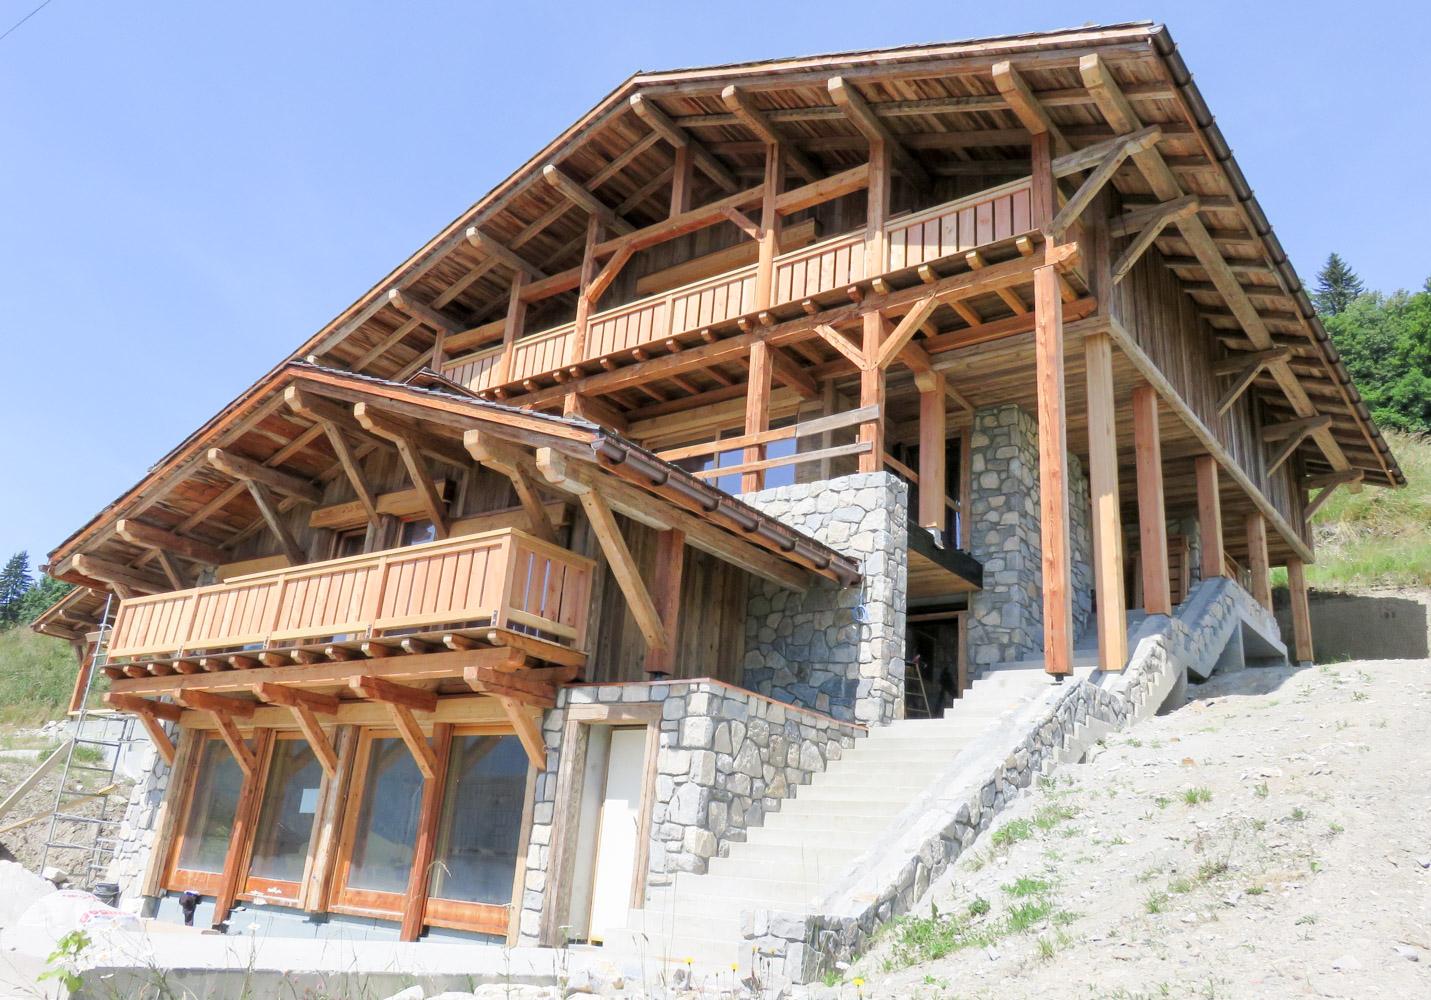 Charpente bottollier cordon haute savoie 74 charpente - Balcon en bois ...